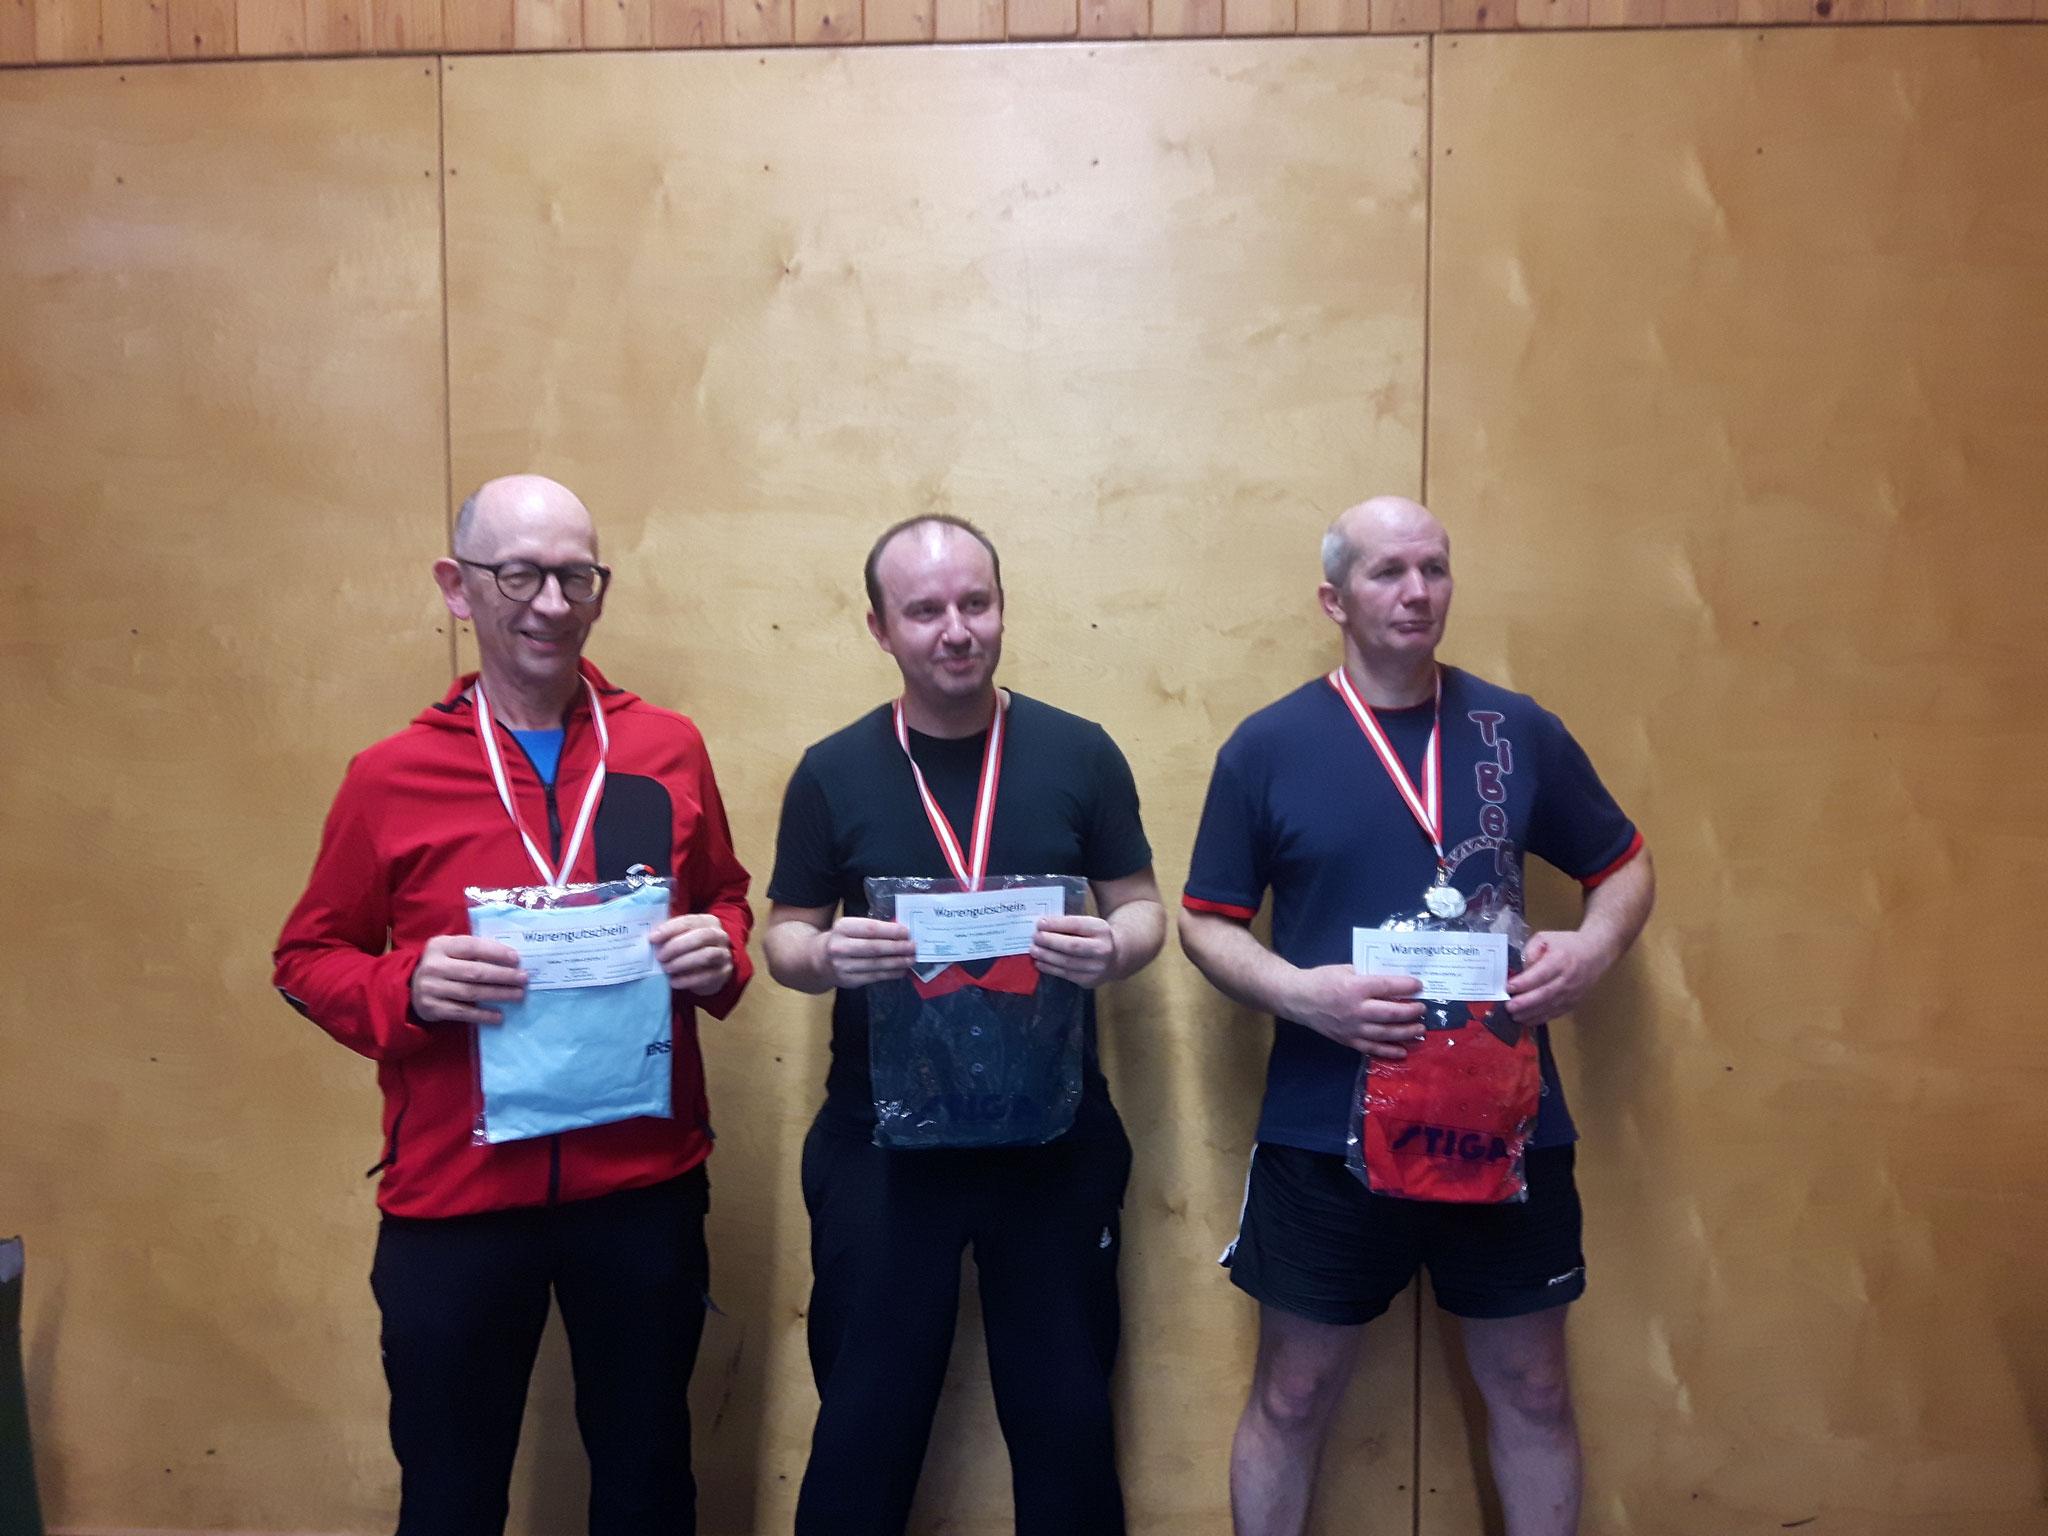 Siegerfoto Bewerb D: v.l.n.r. Karl Krajic (WPAE) (Platz 3), Pawel Piotr Galek (LENZ) (Sieger), Endre Pelsöczi (URAP) (Platz 2)